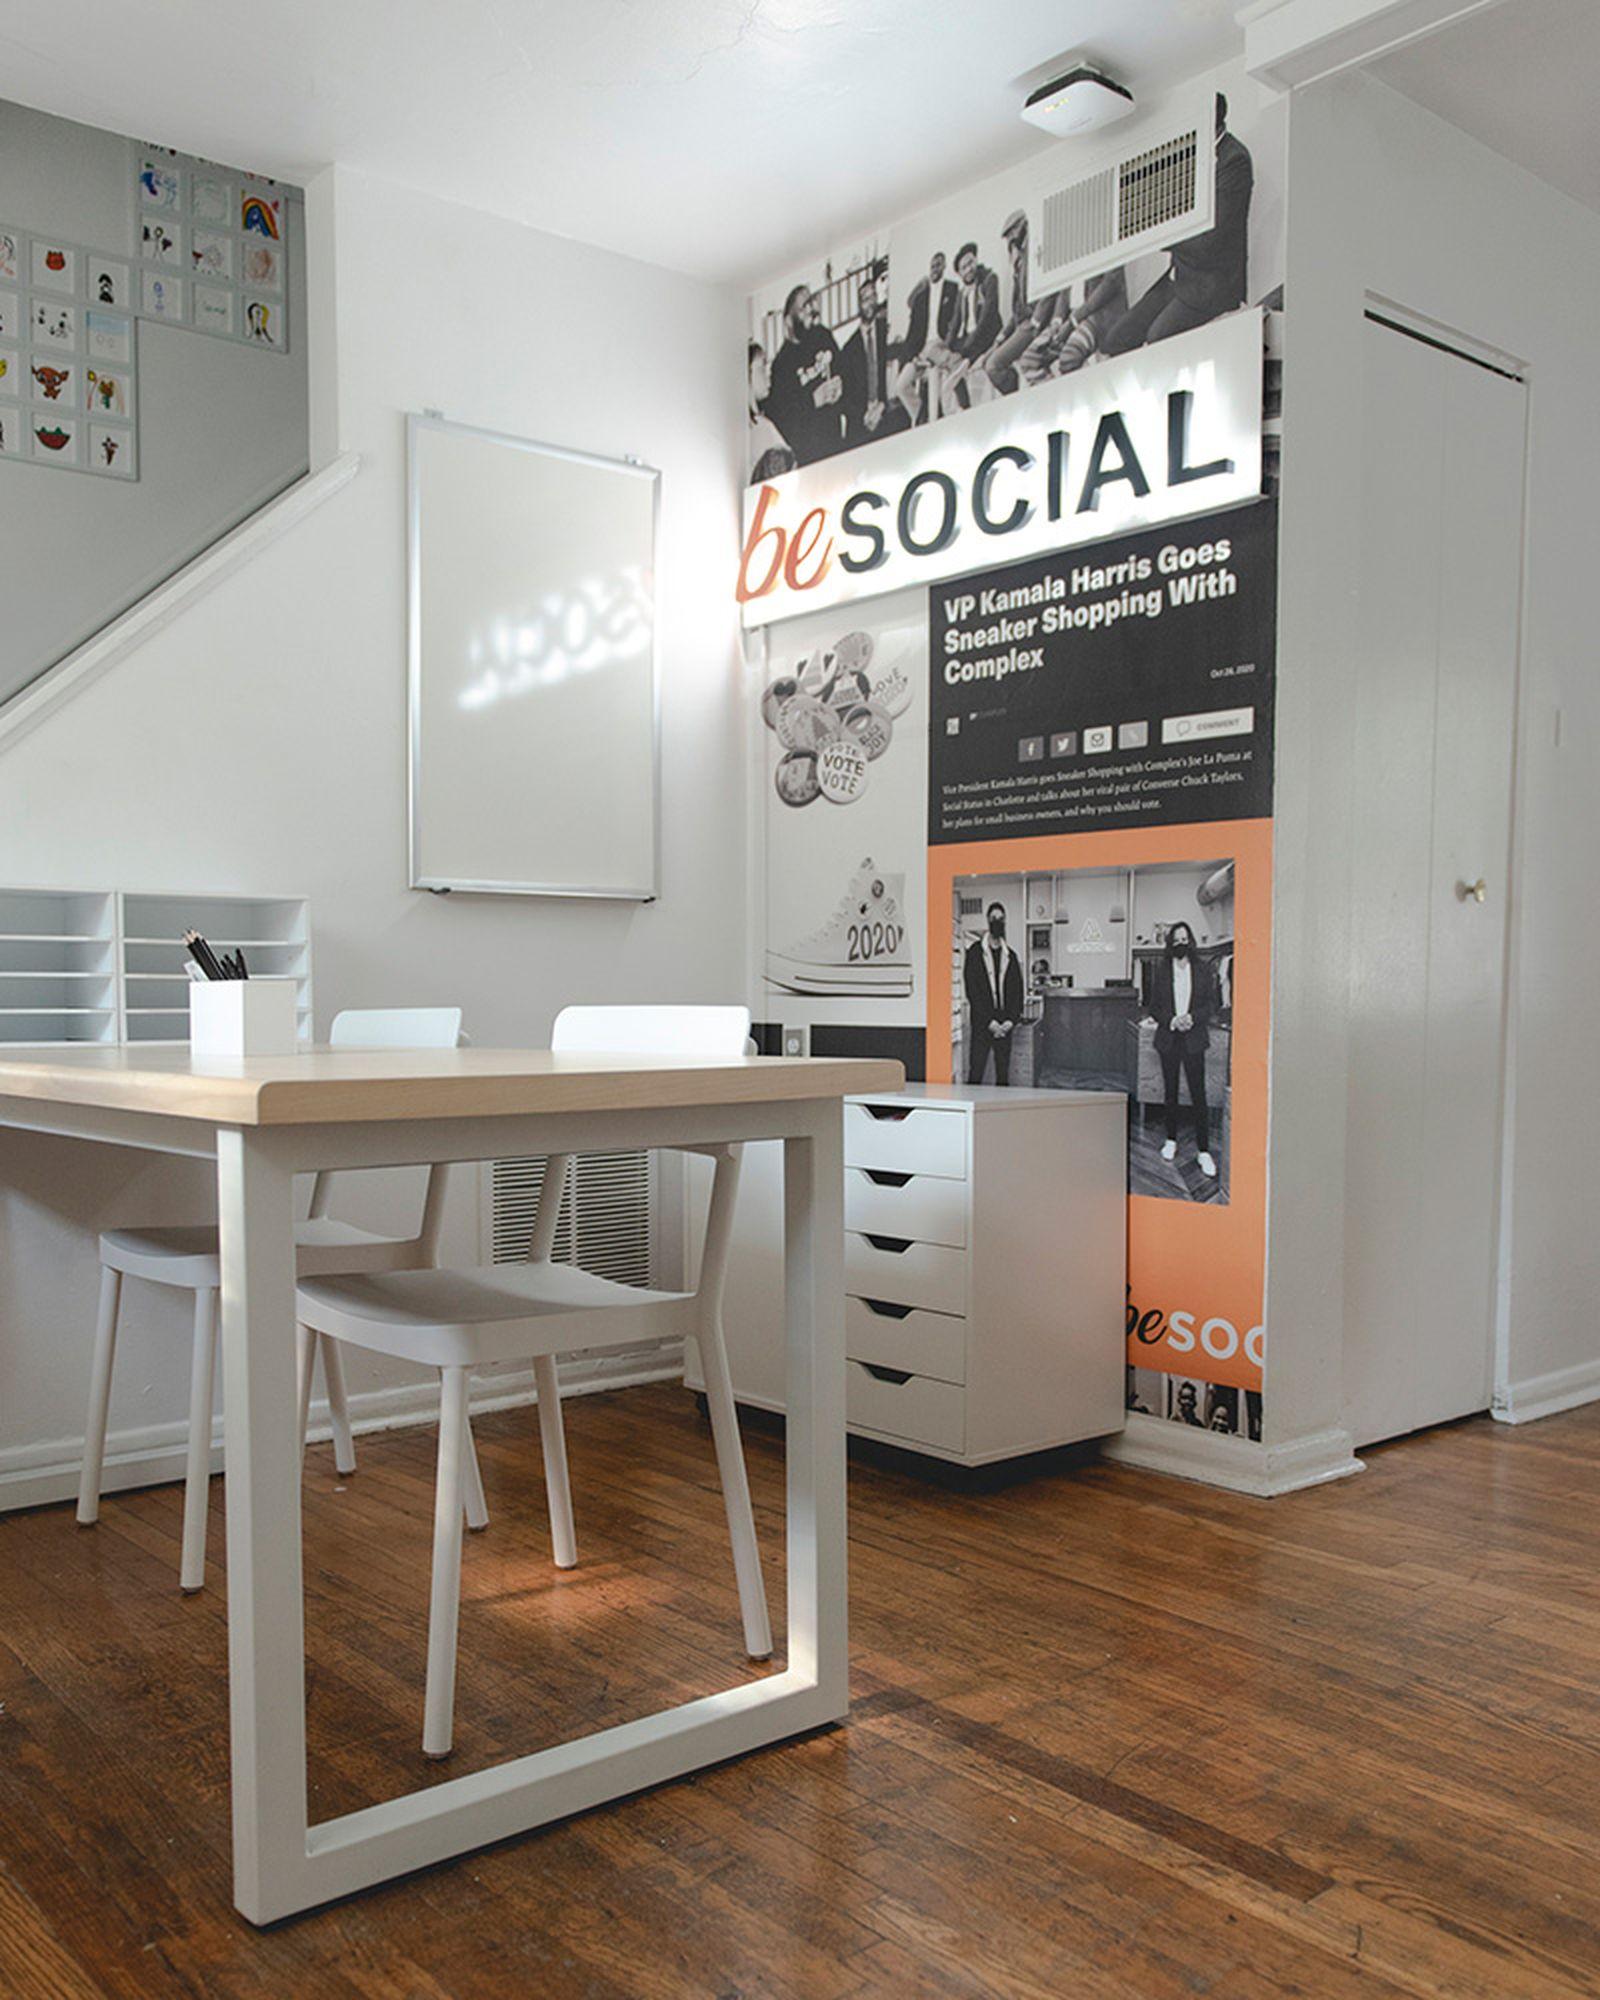 social-status-nike-dunk-mid-interview-beSocialMV_22